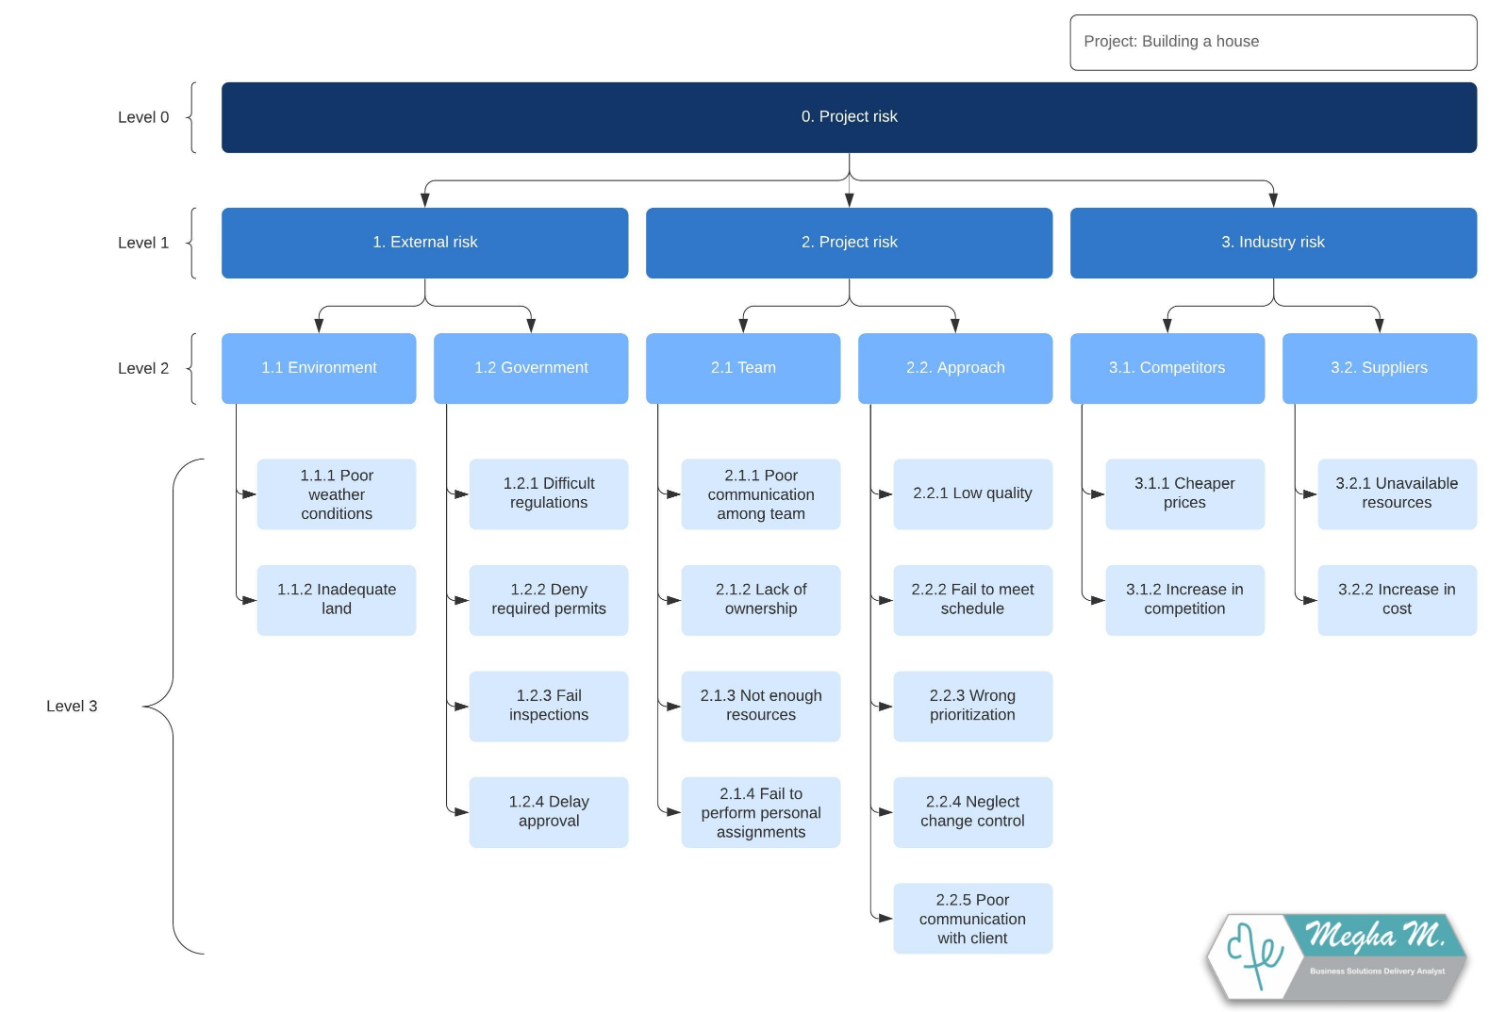 Projektstrukturplan-Vorlage 3